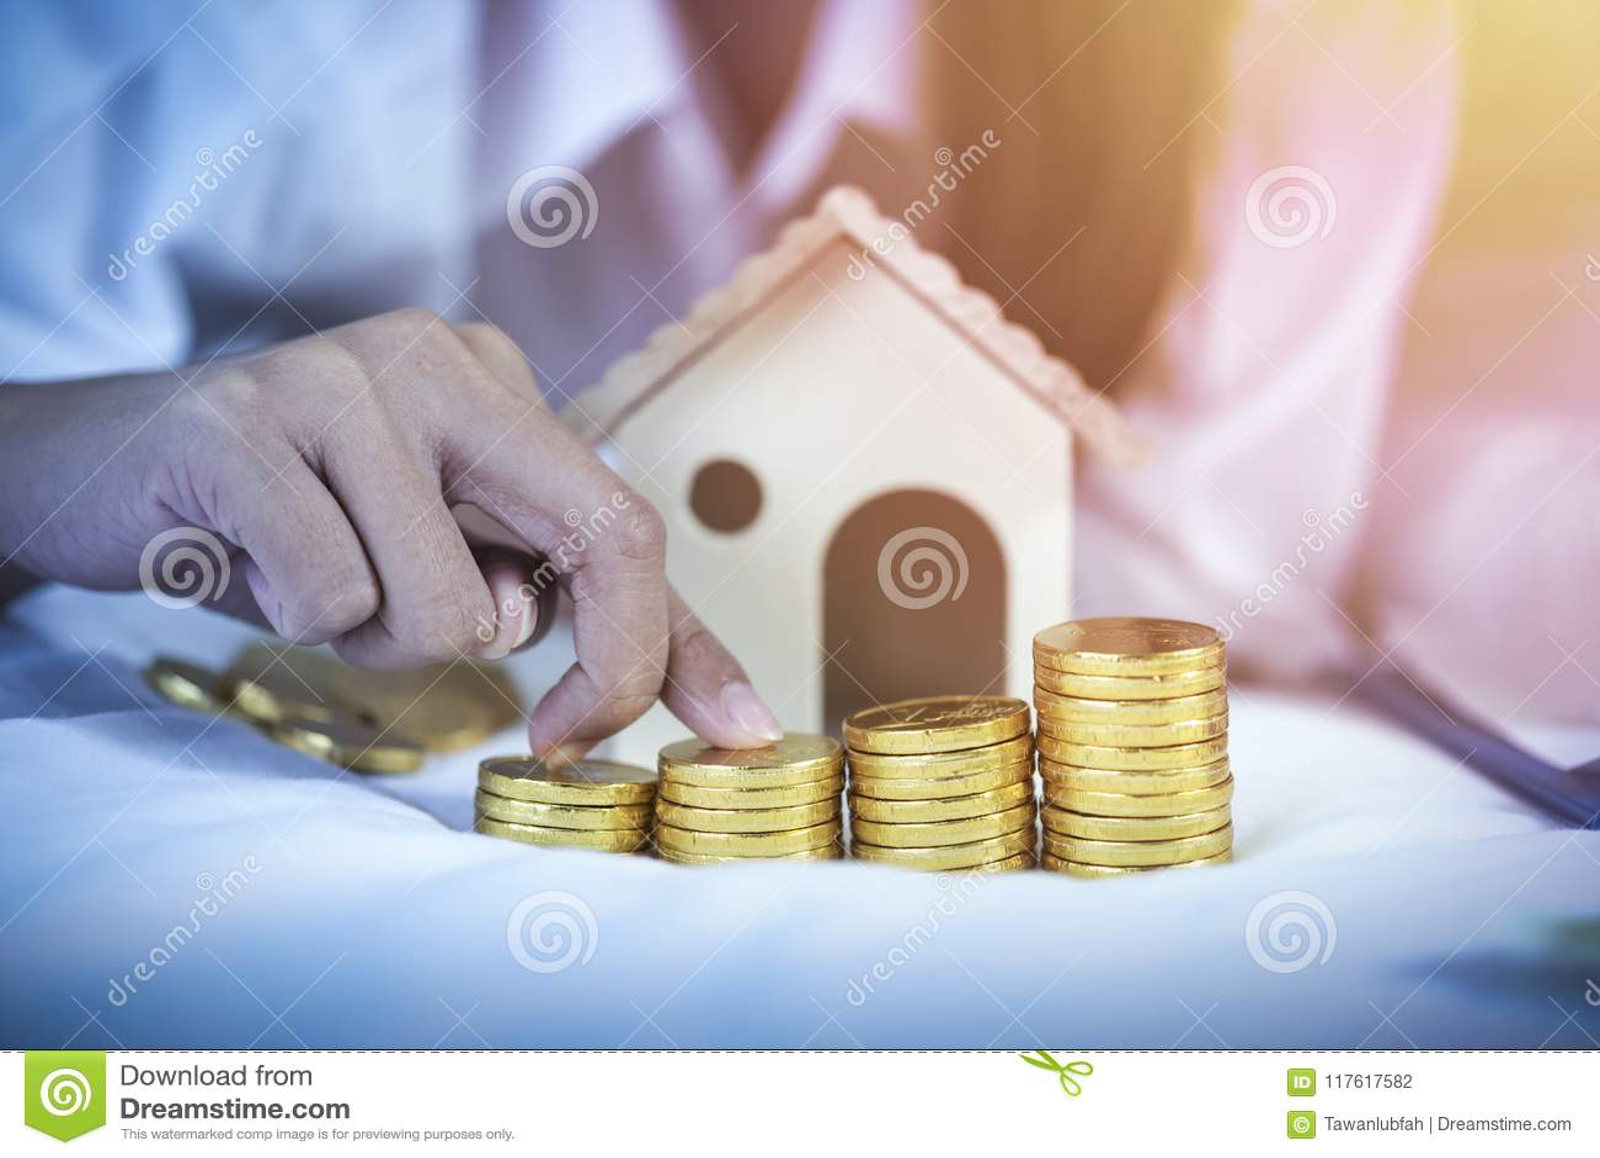 Besparing, pensioneringsplan, financiële planningsconcept Jonge coupl